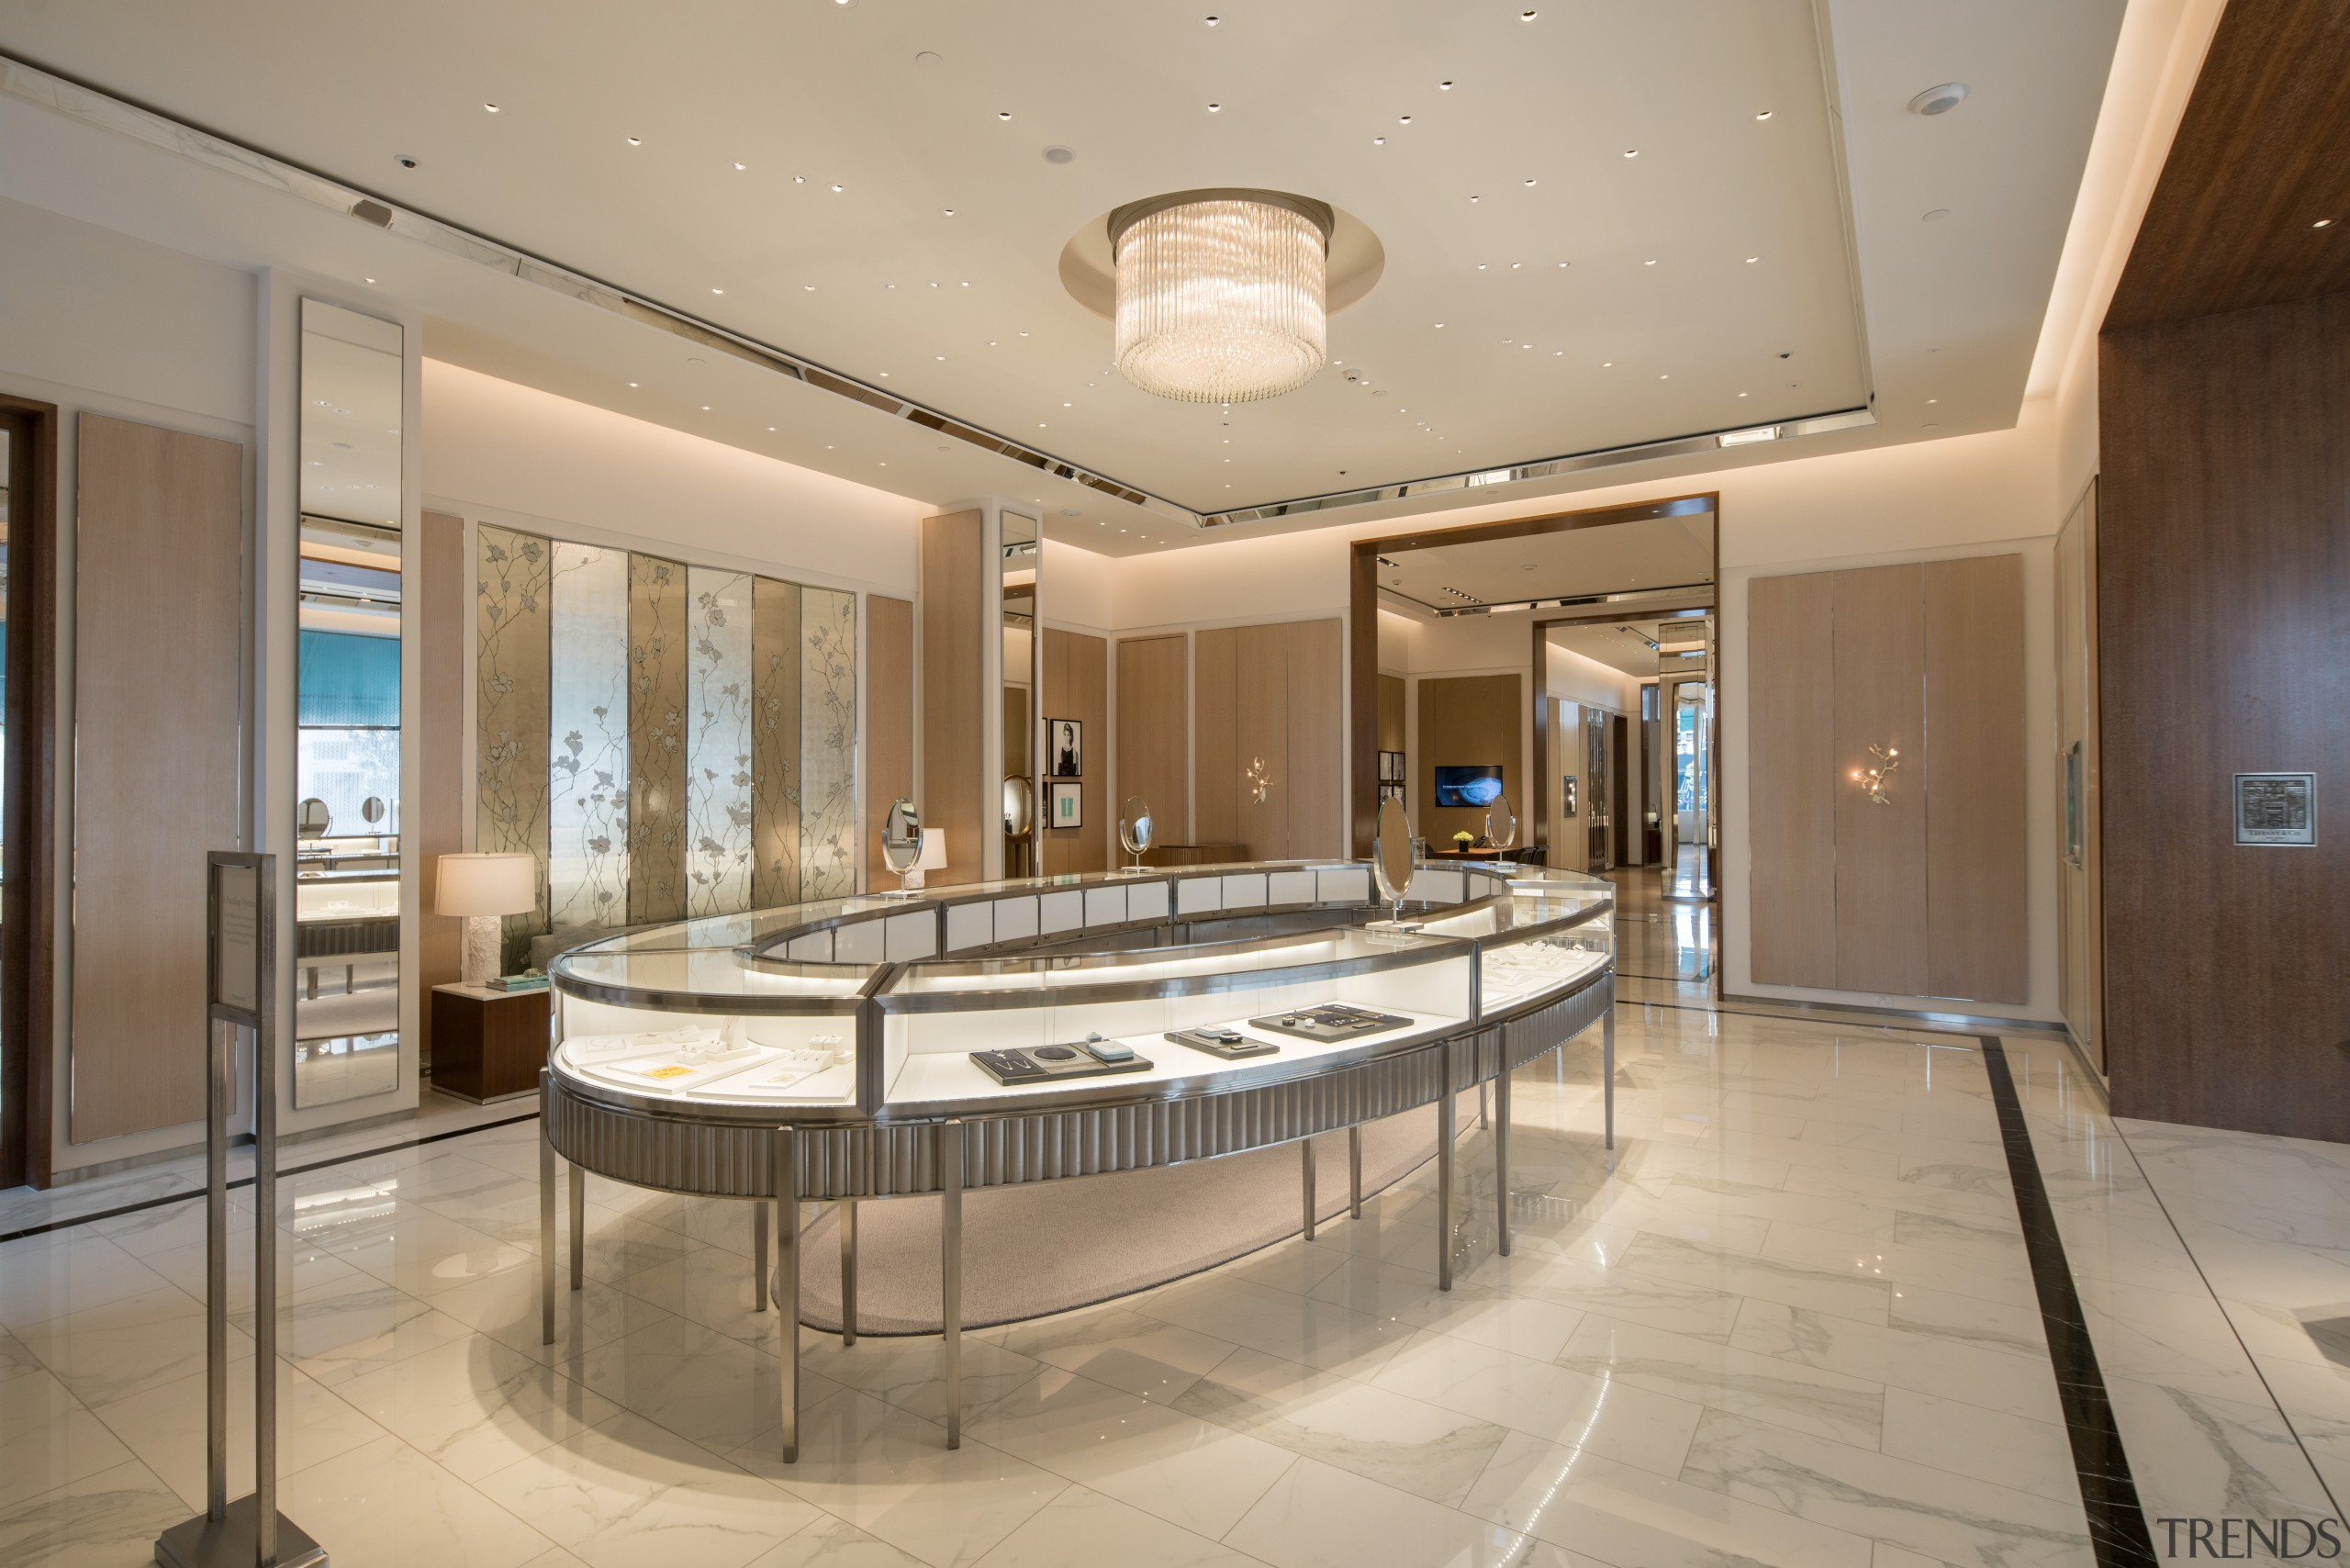 :Successful retail developments manage to combine a mix ceiling, estate, interior design, lobby, real estate, orange, brown